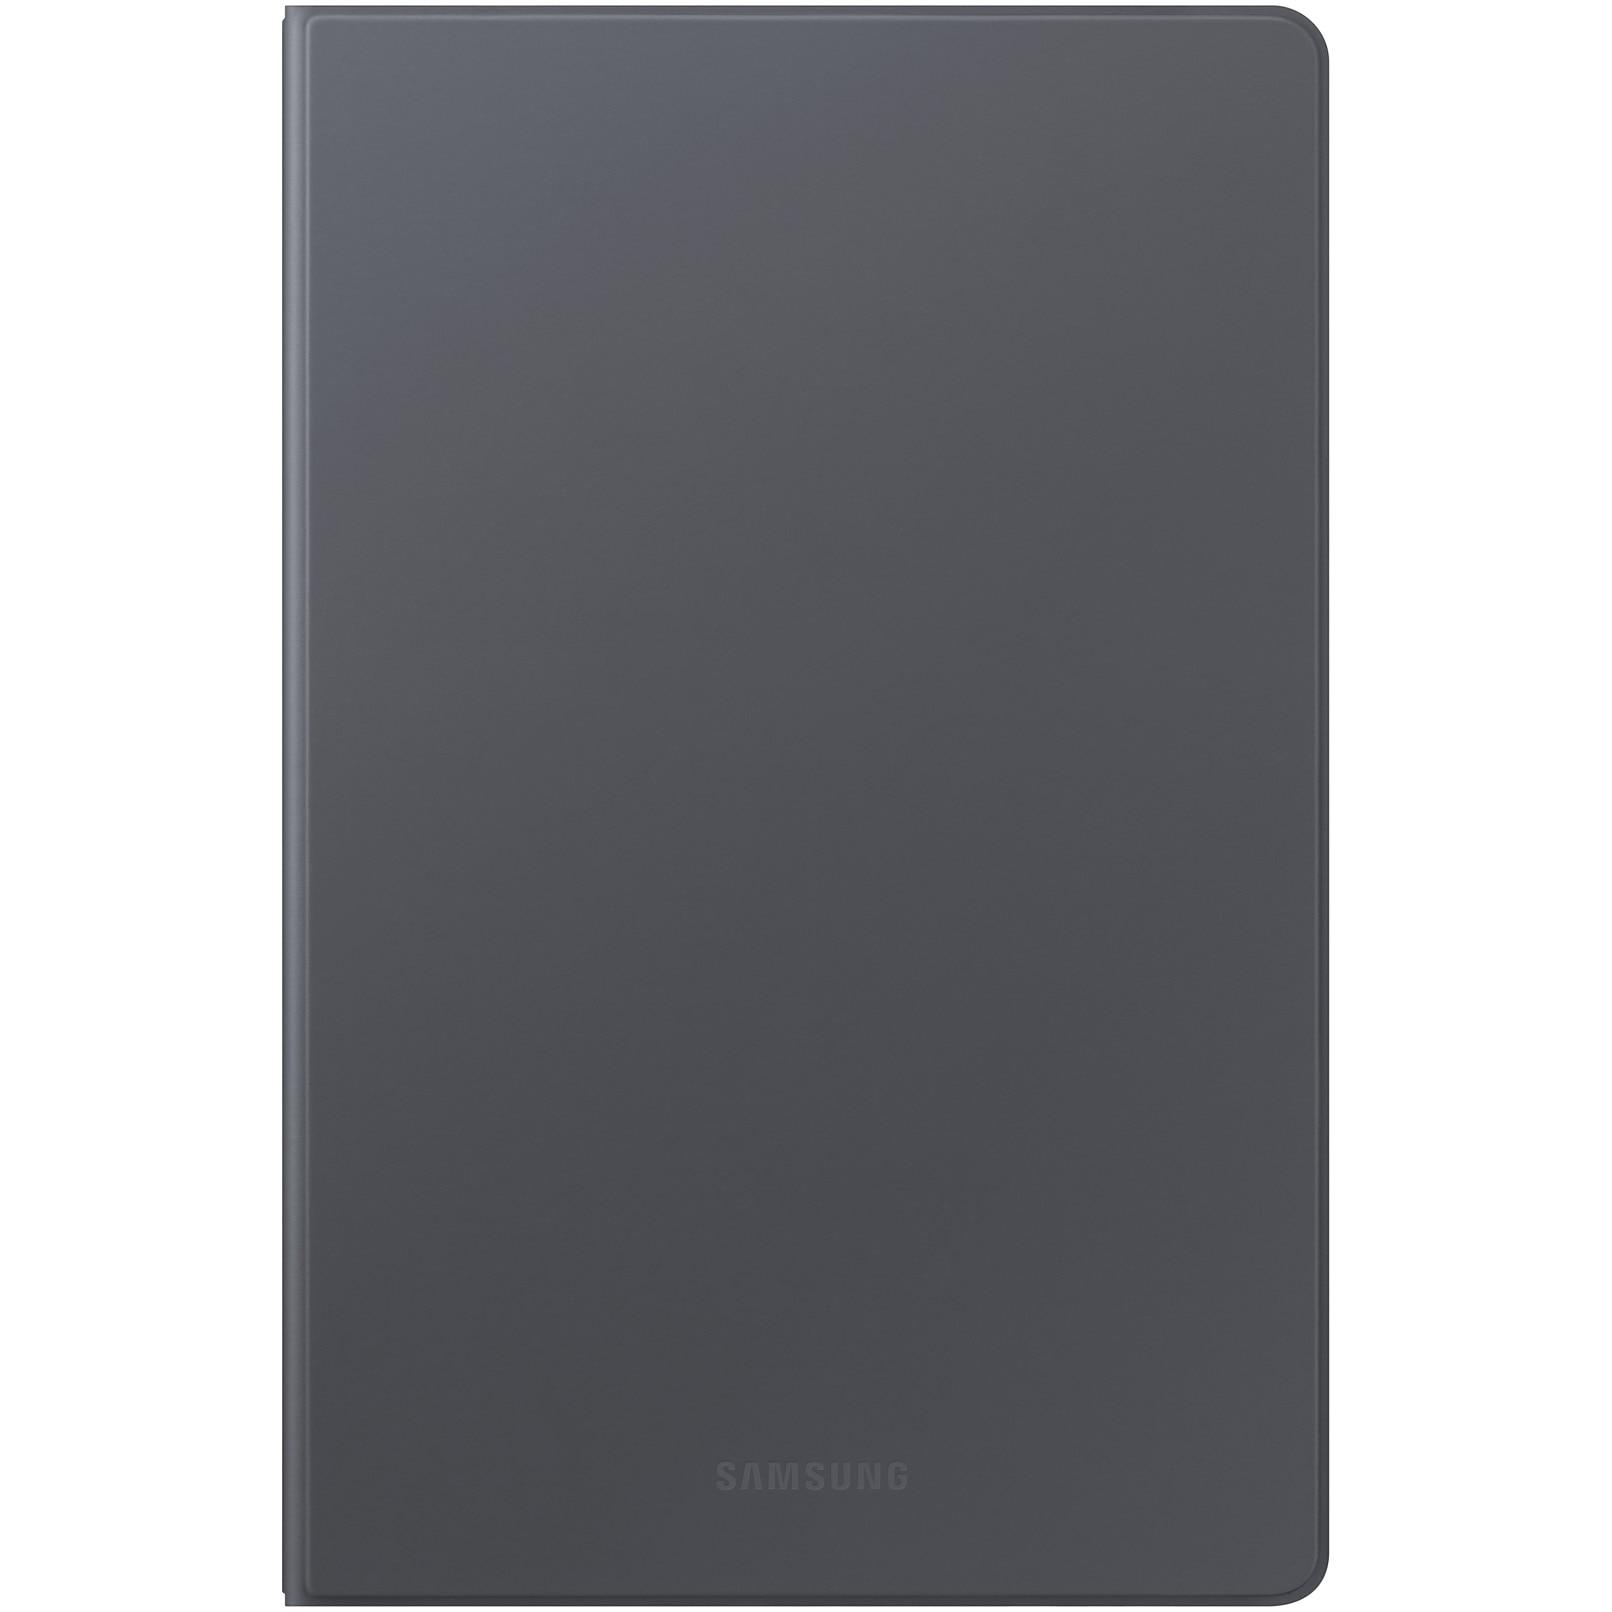 Fotografie Husa de protectie Samsung Book Cover pentru Galaxy Tab A7, Gray